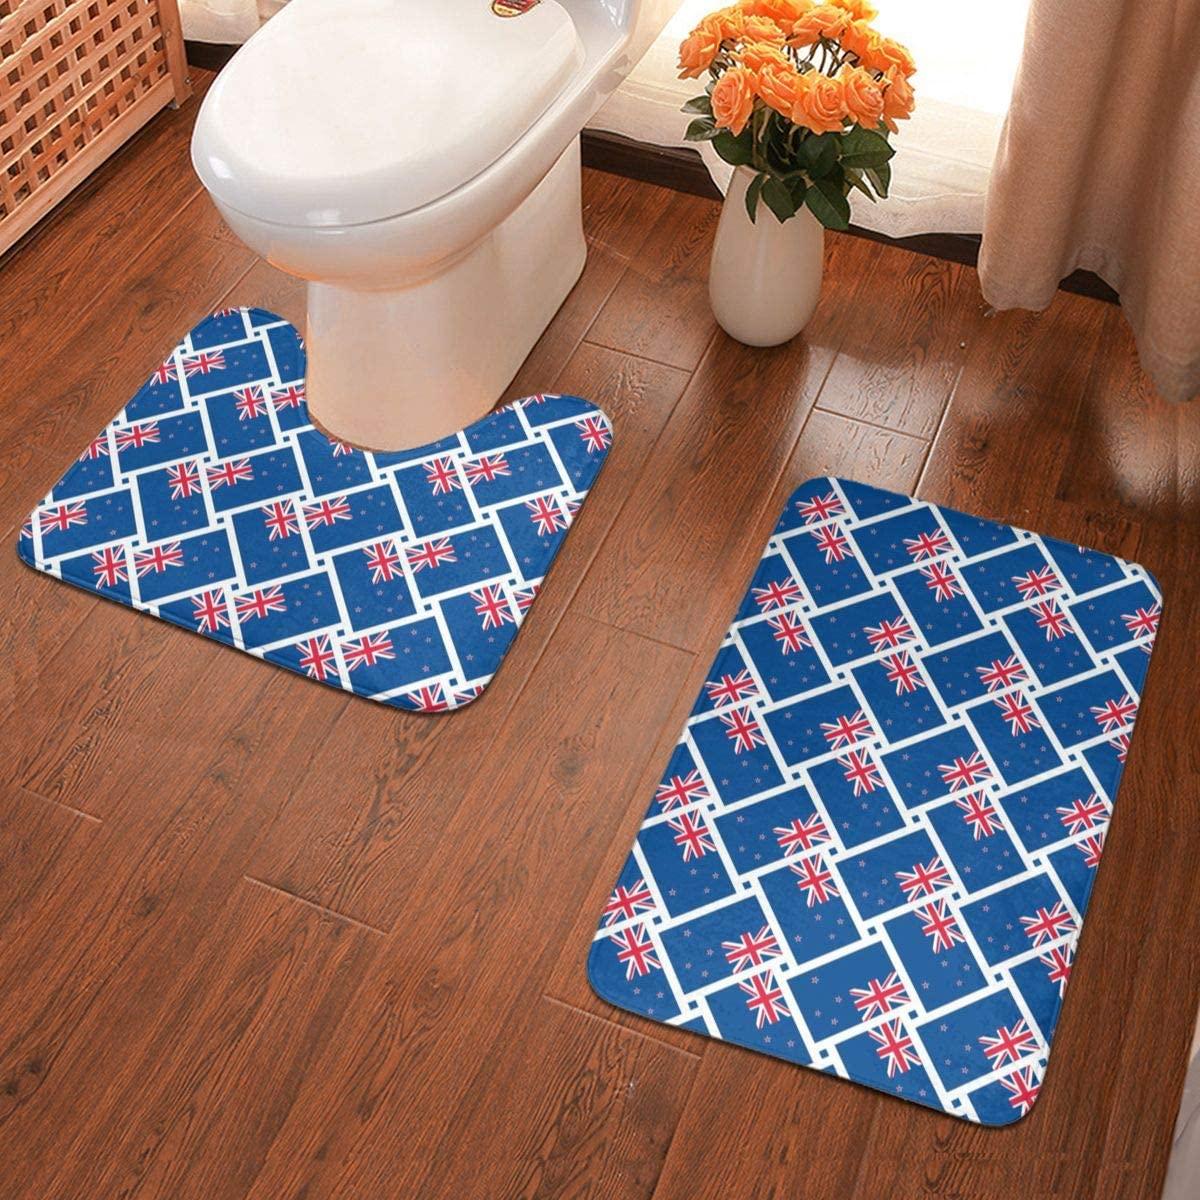 NiYoung Bathroom Mat Sets 2 Piece Rugs New Zealand Flag Memory Foam Mat Set Matches Anti-Skid Toilet Seat Cover Bath Mat